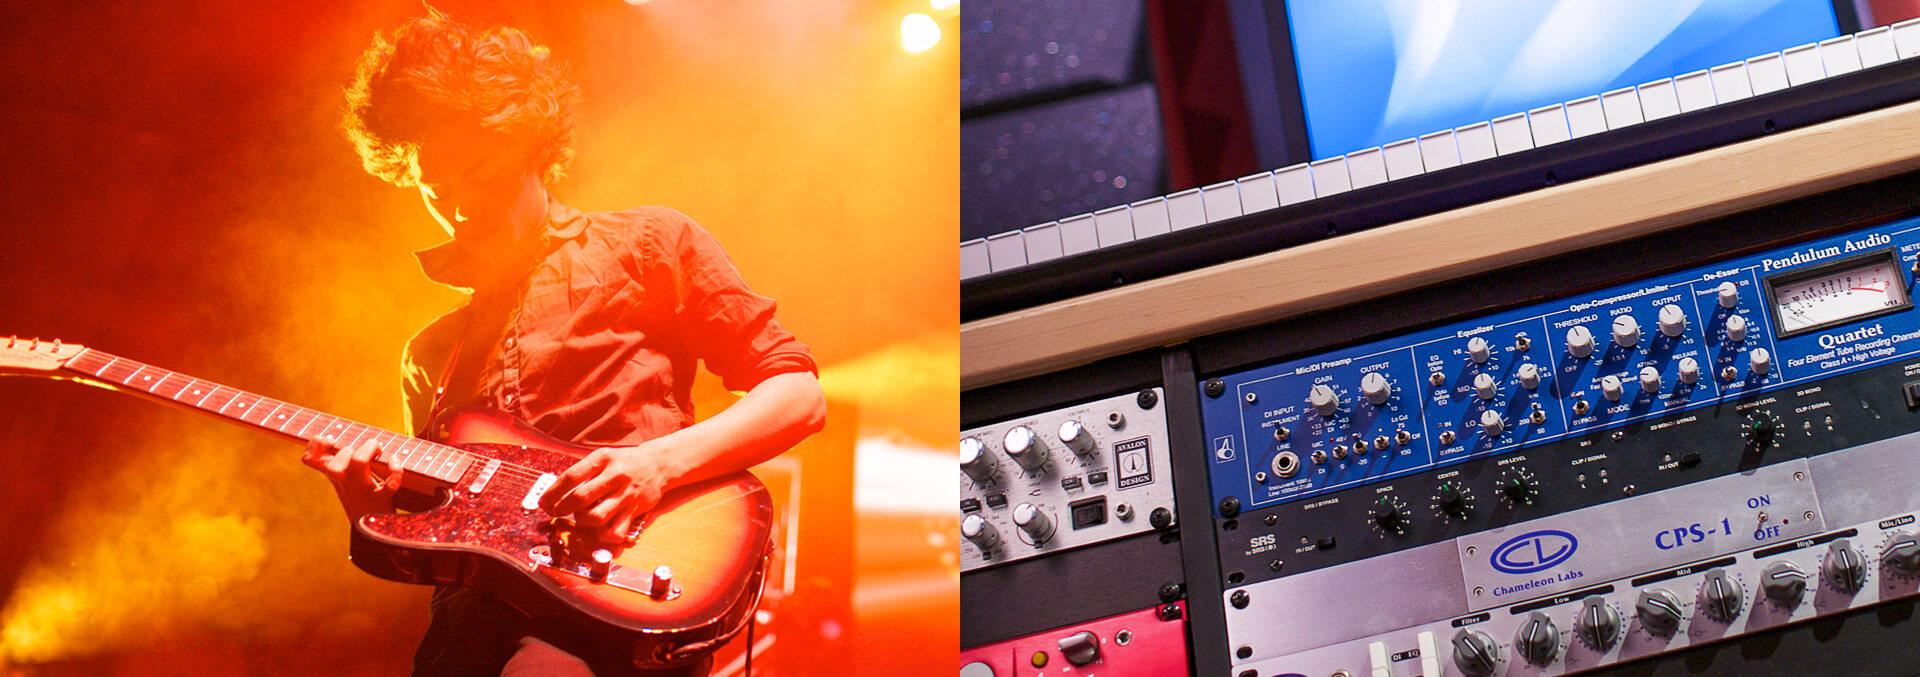 home_music_studio